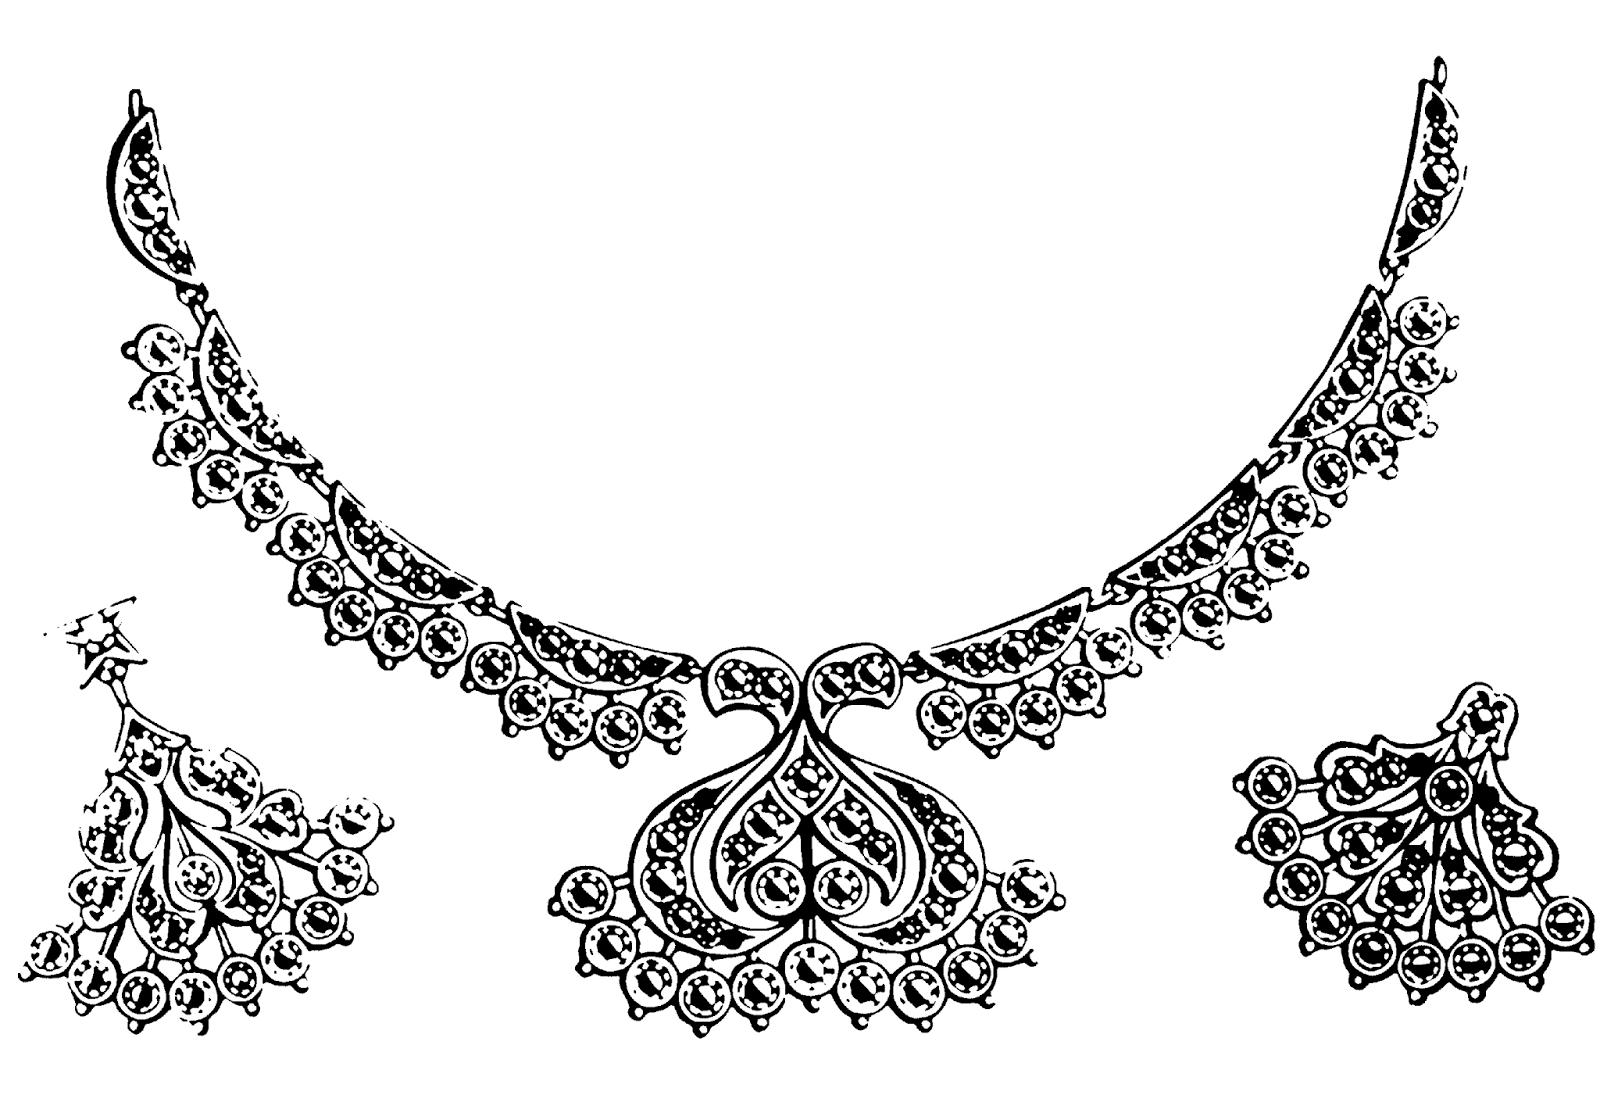 Jewelry clipart Clipart Jewelry Savoronmorehead Clipart jewelry